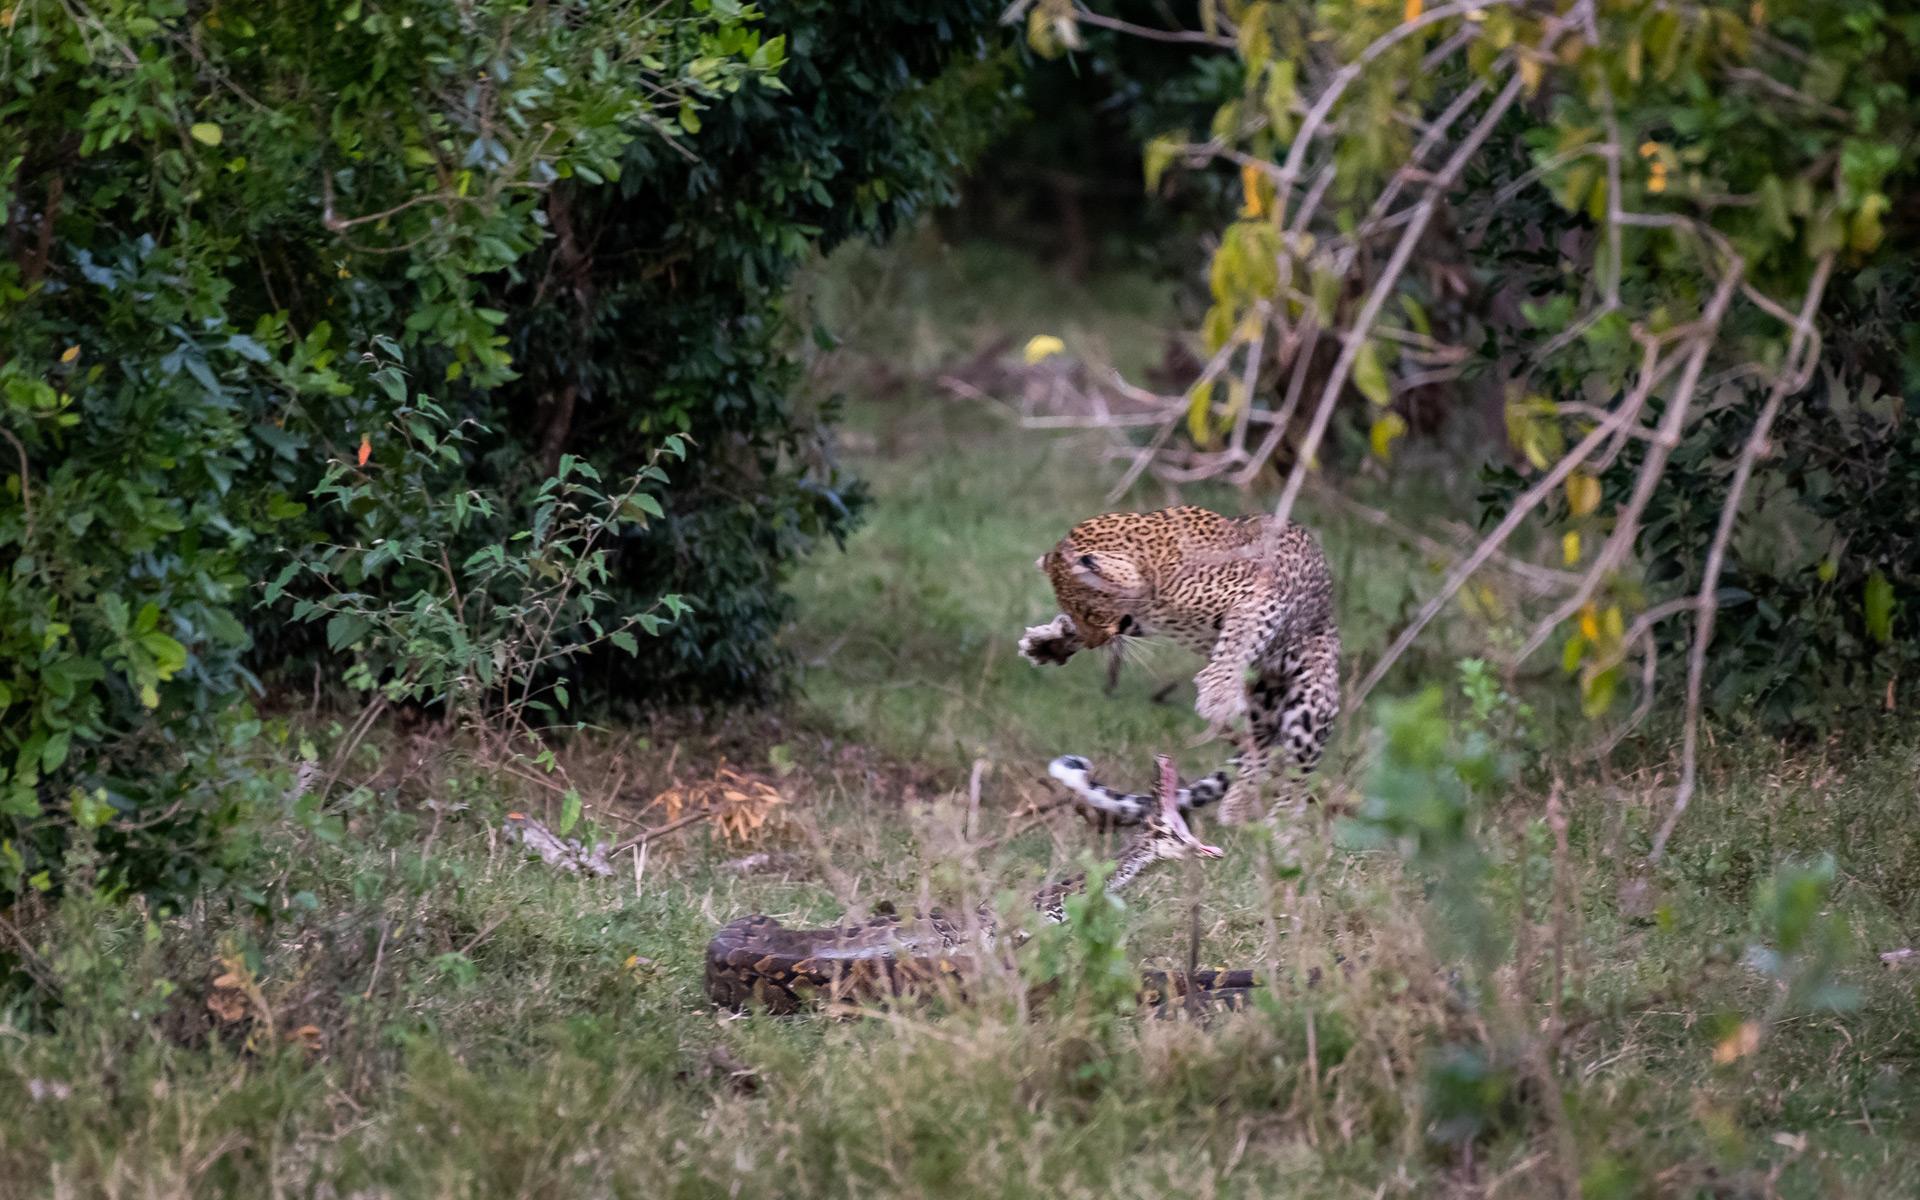 Leopard attacking python